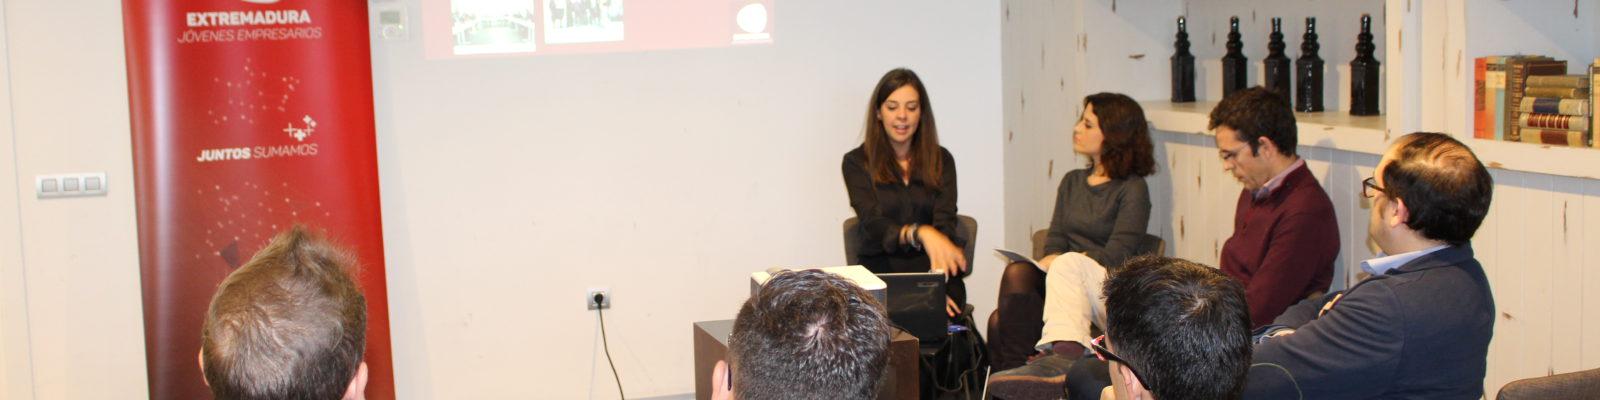 Asamblea Extraordinaria para Socios AJE Extremadura